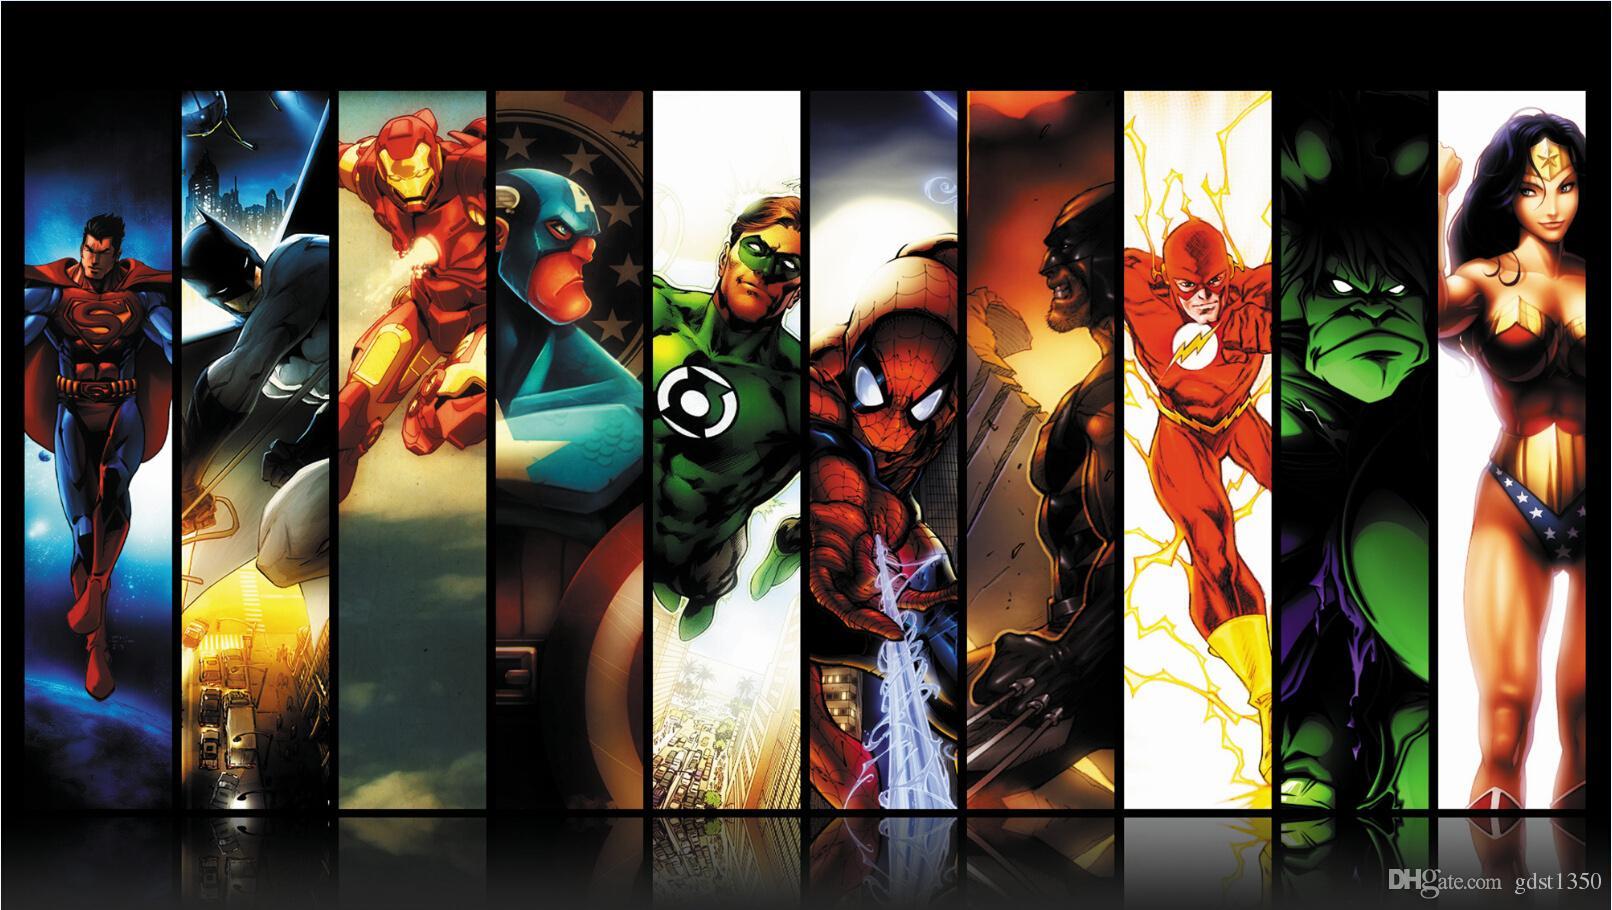 Marvel Bedroom Wallpaper 24x42inch Comics Marvel Avengers Superhero Poster Hd Home Wall